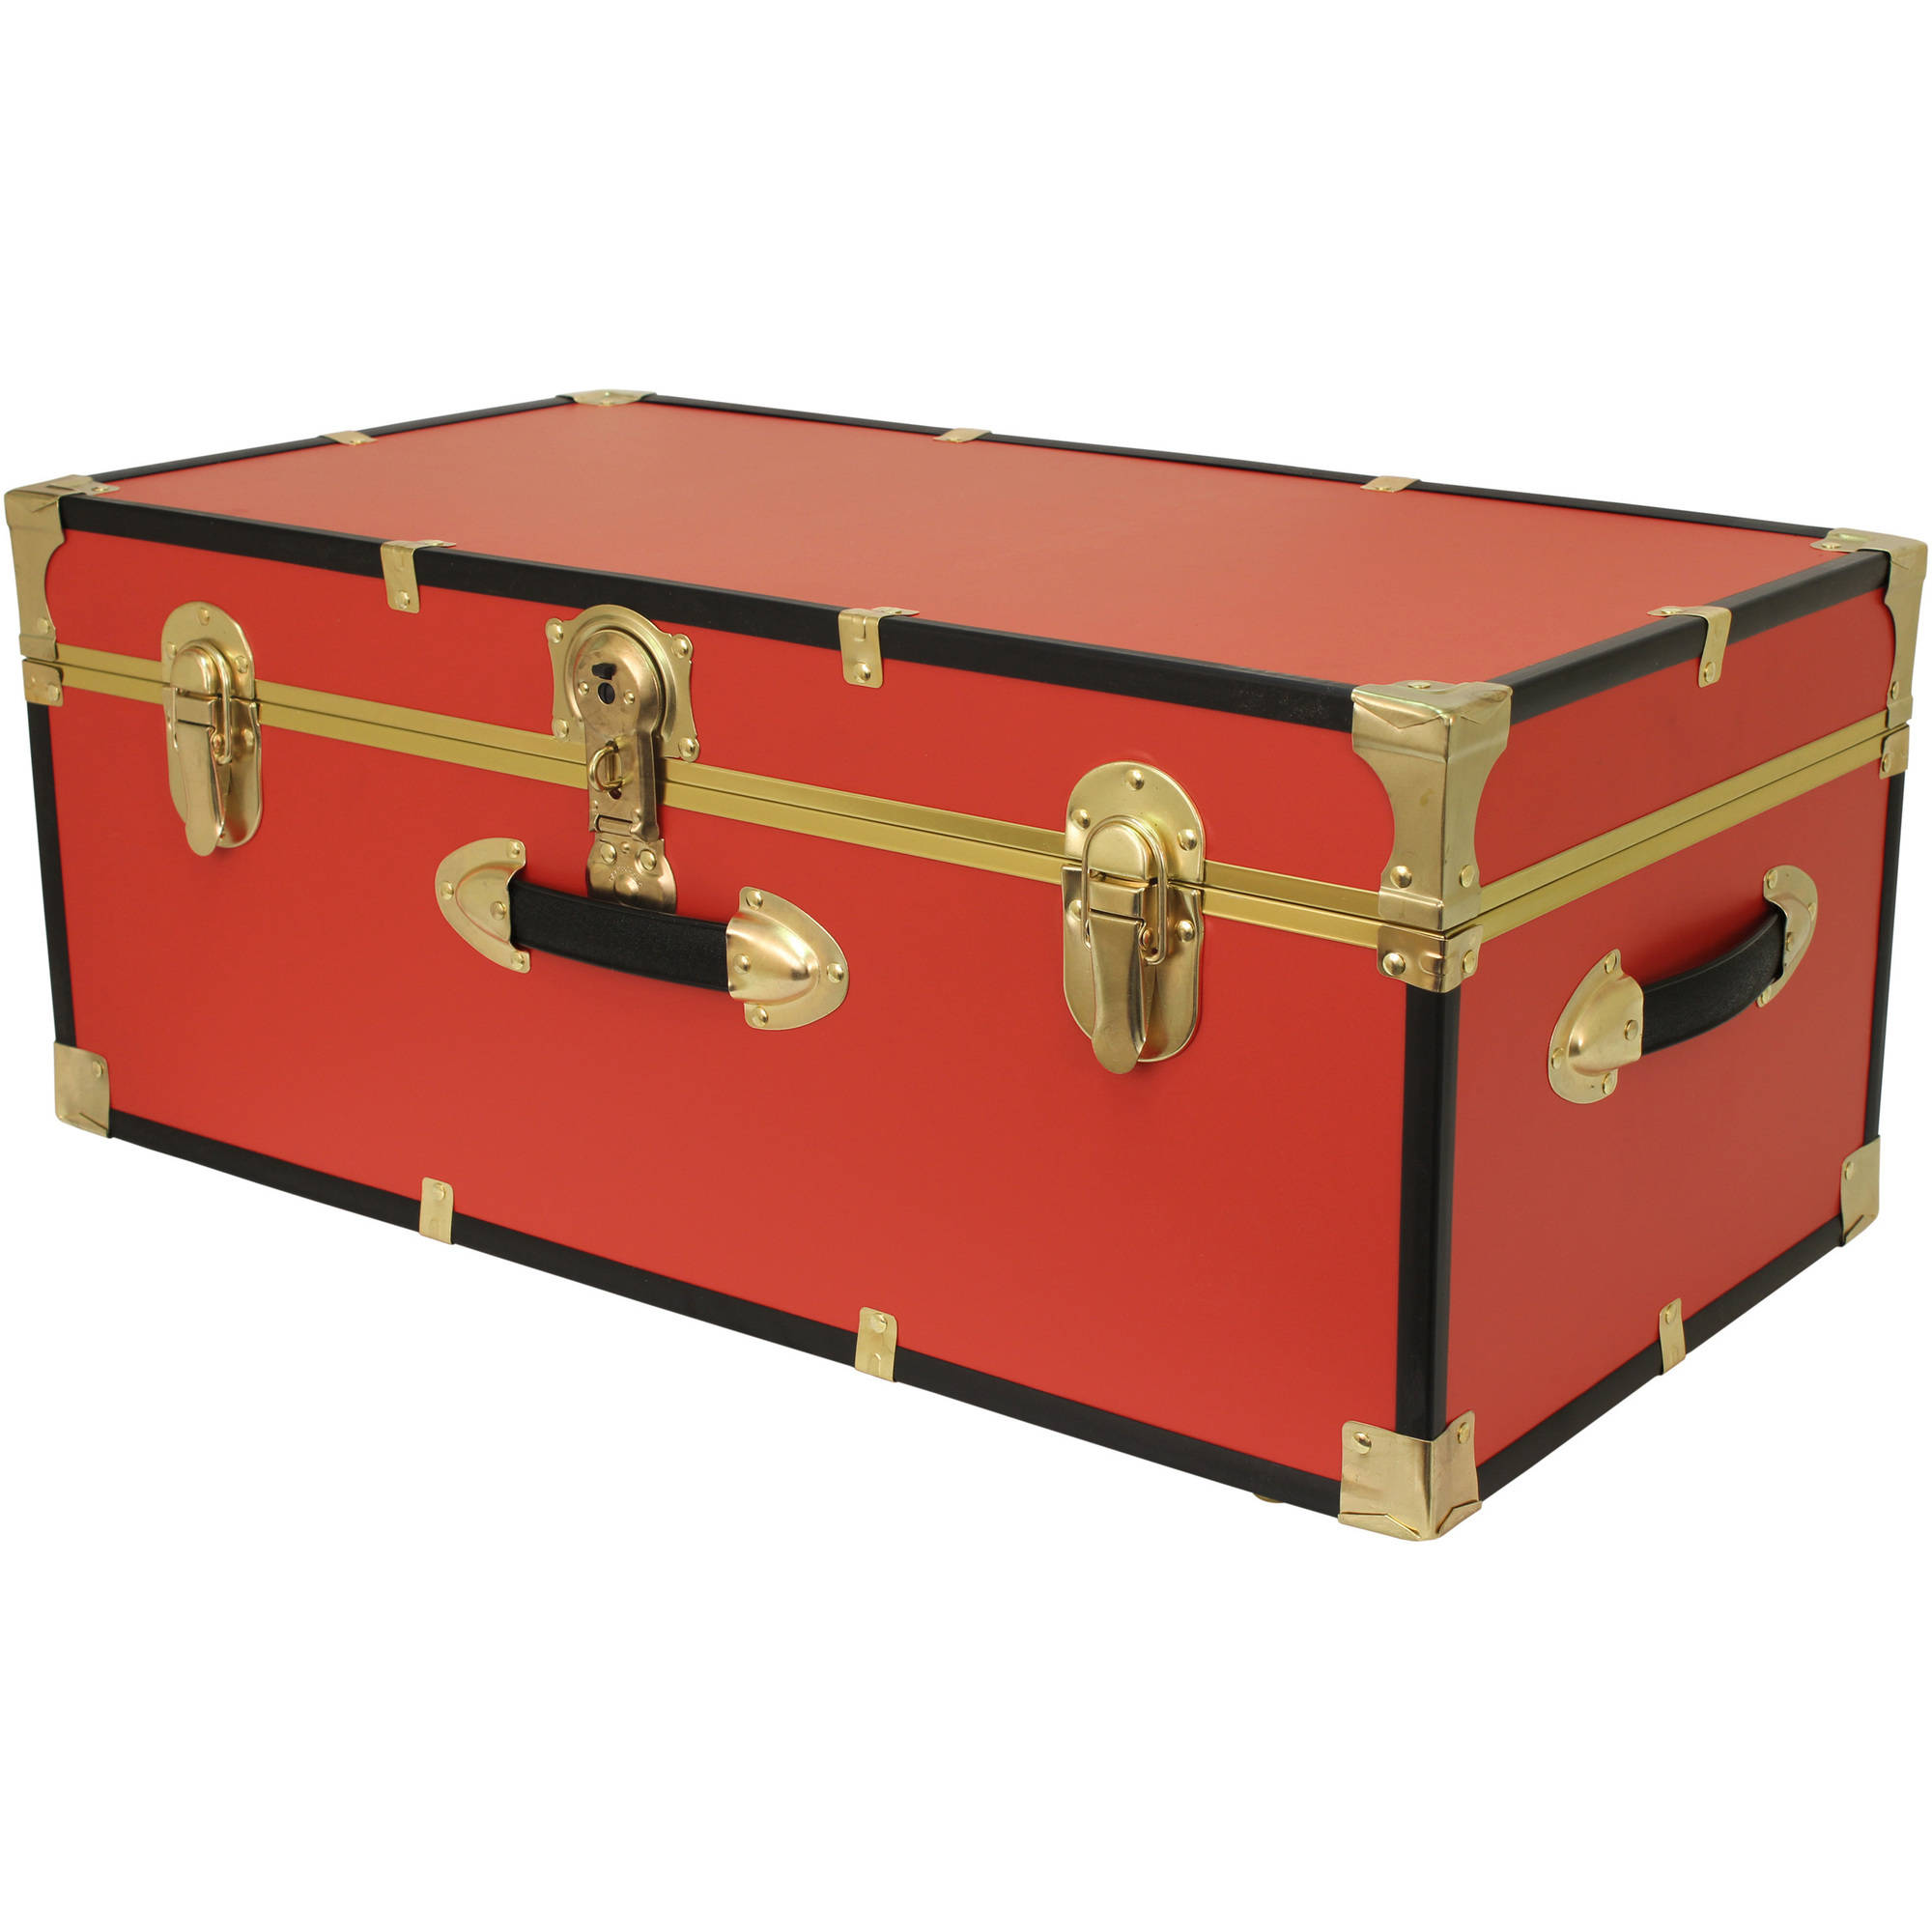 Seward Trunk Collegiate Collection Footlocker Trunk 25 Gal. Wood Storage  Box With Handles, Black   Walmart.com